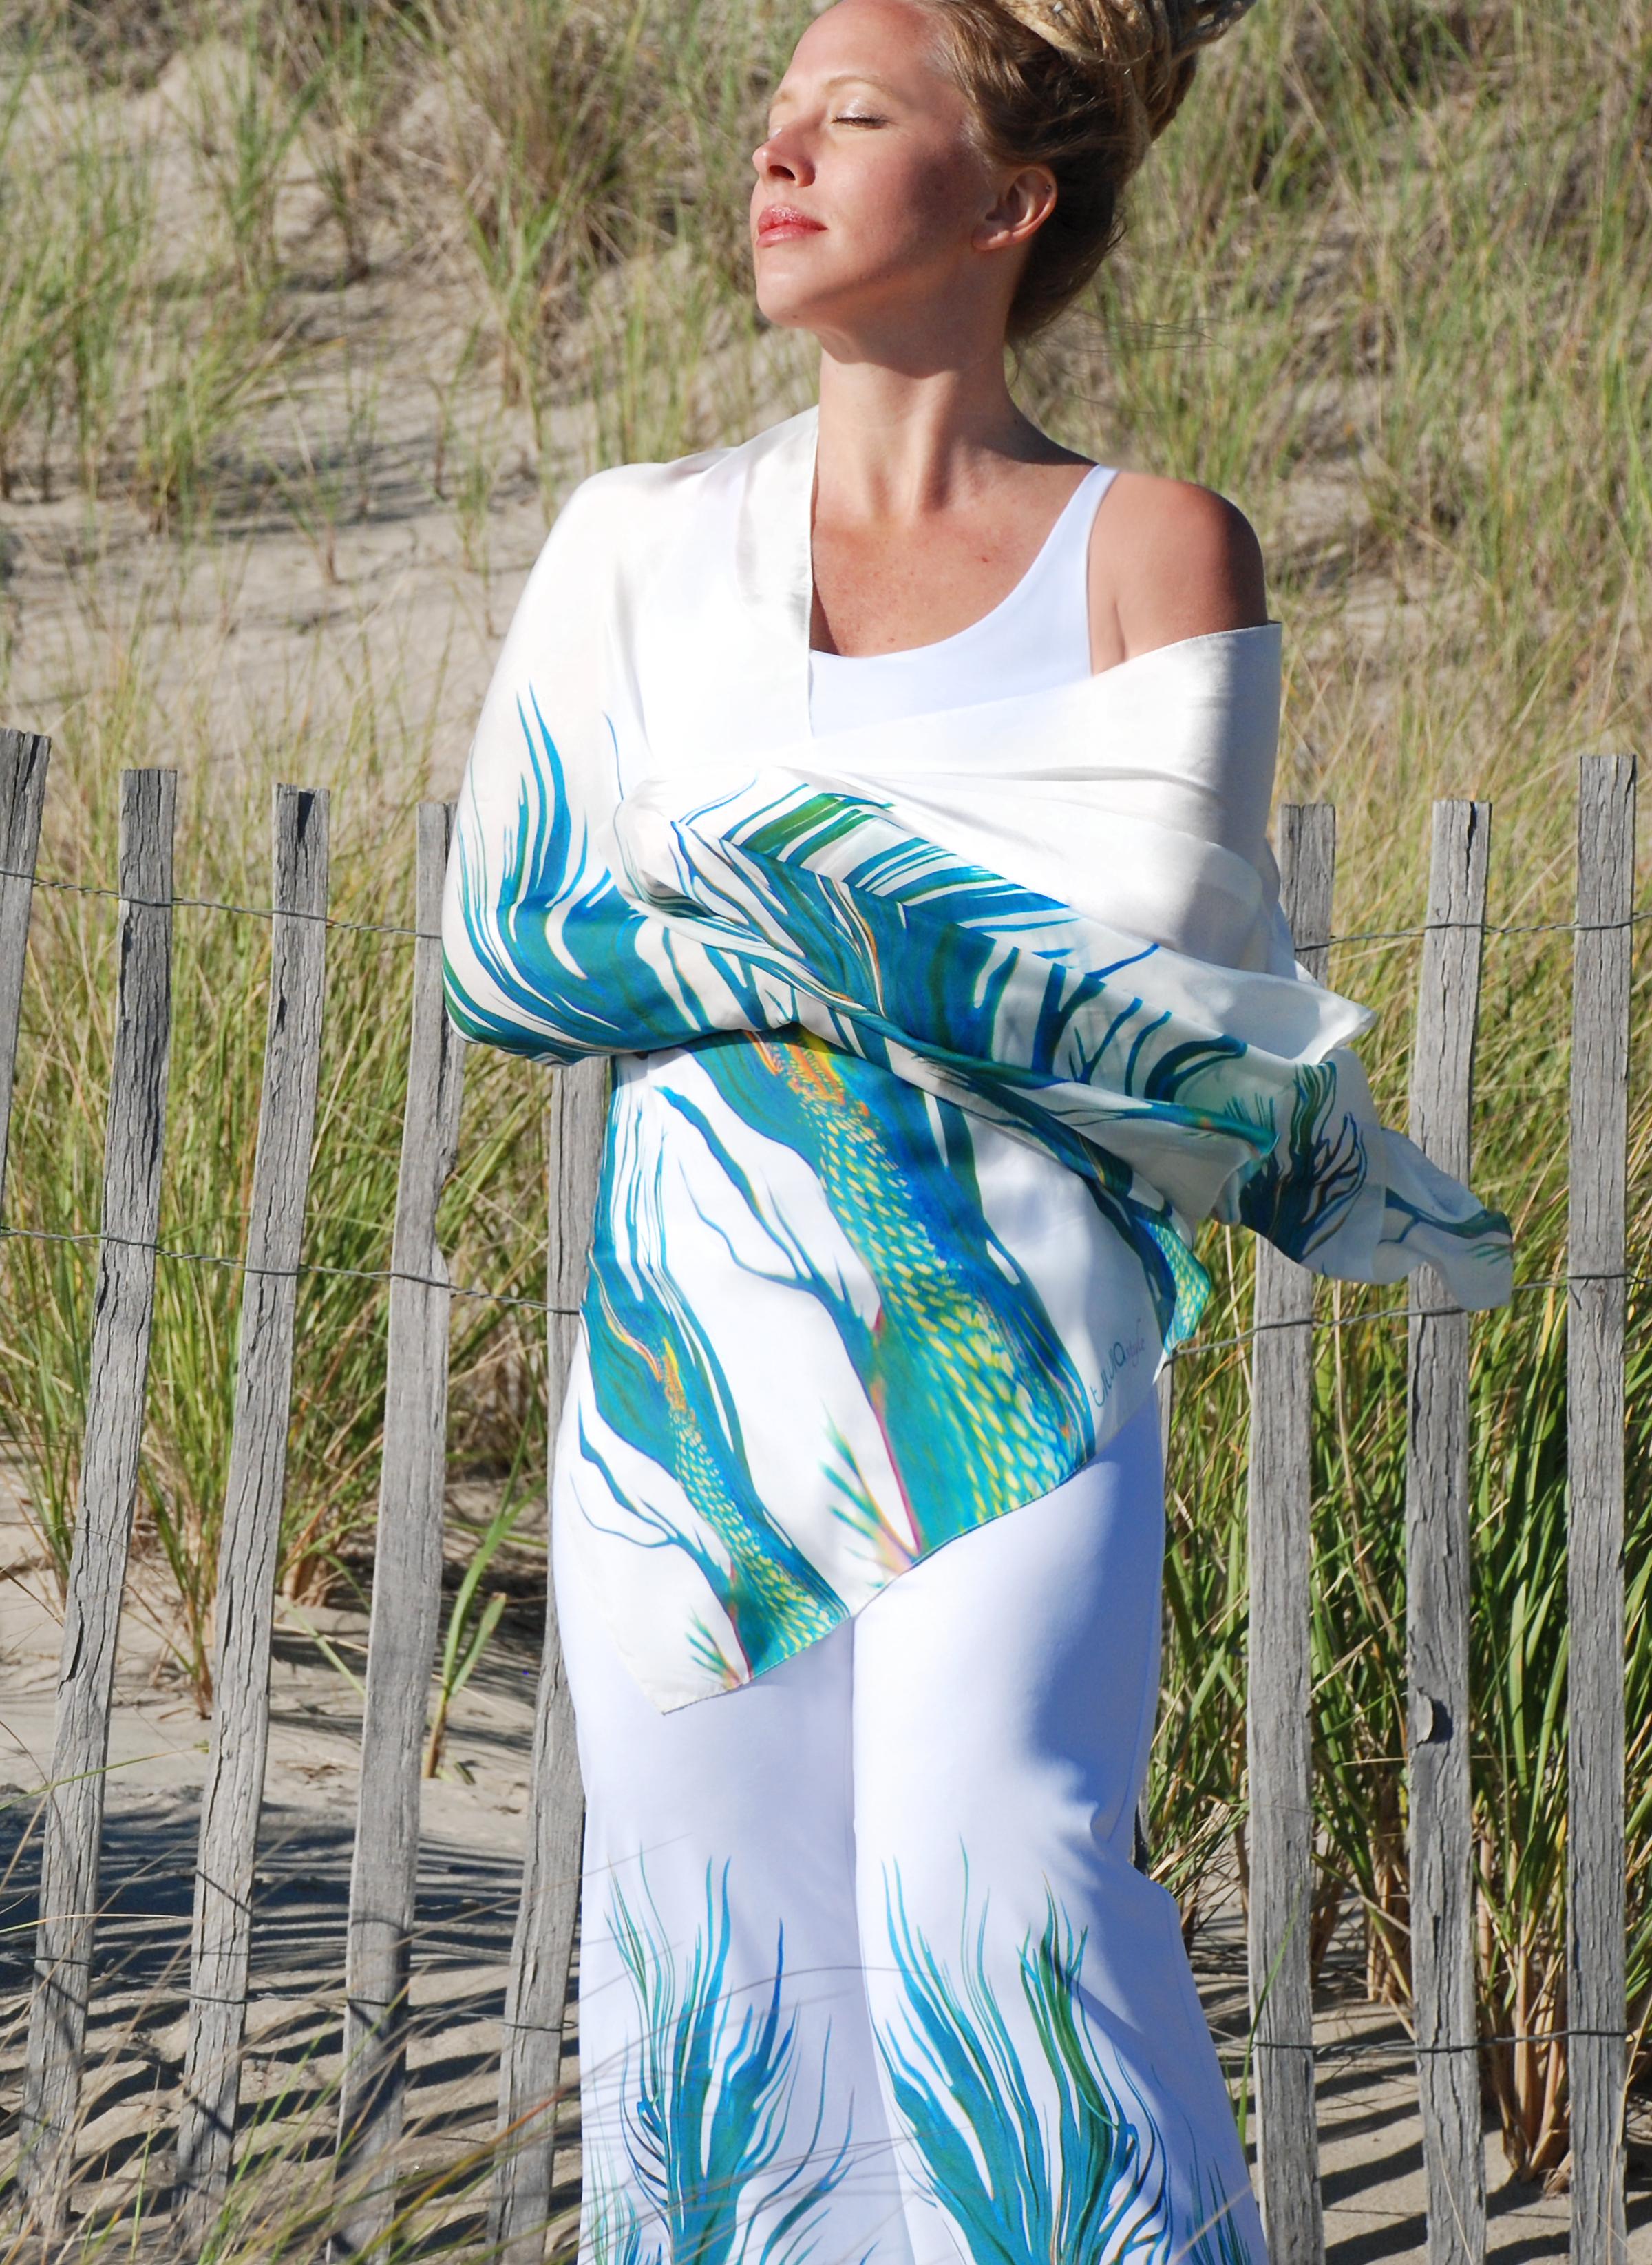 tiwia dive deep silk wrap rozlynne 1 shop gallery shots.png